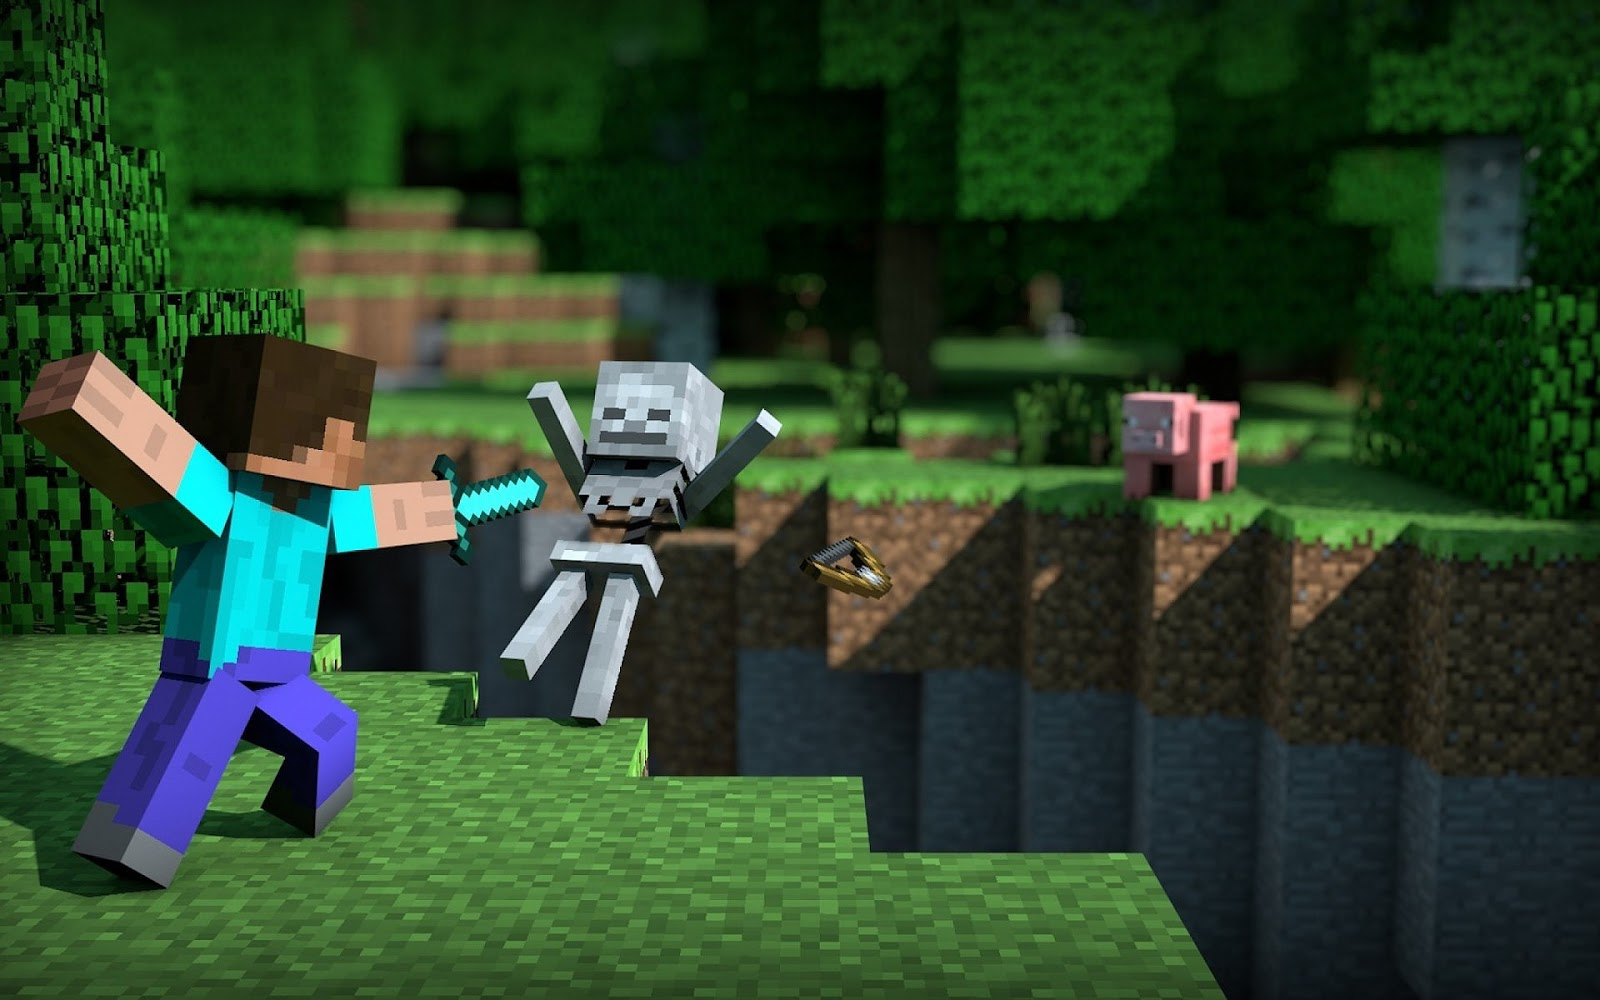 Beautiful Wallpaper Minecraft Youtube - 3d-game-screenshot-minecraft-wallpaper  Image_48316.jpg